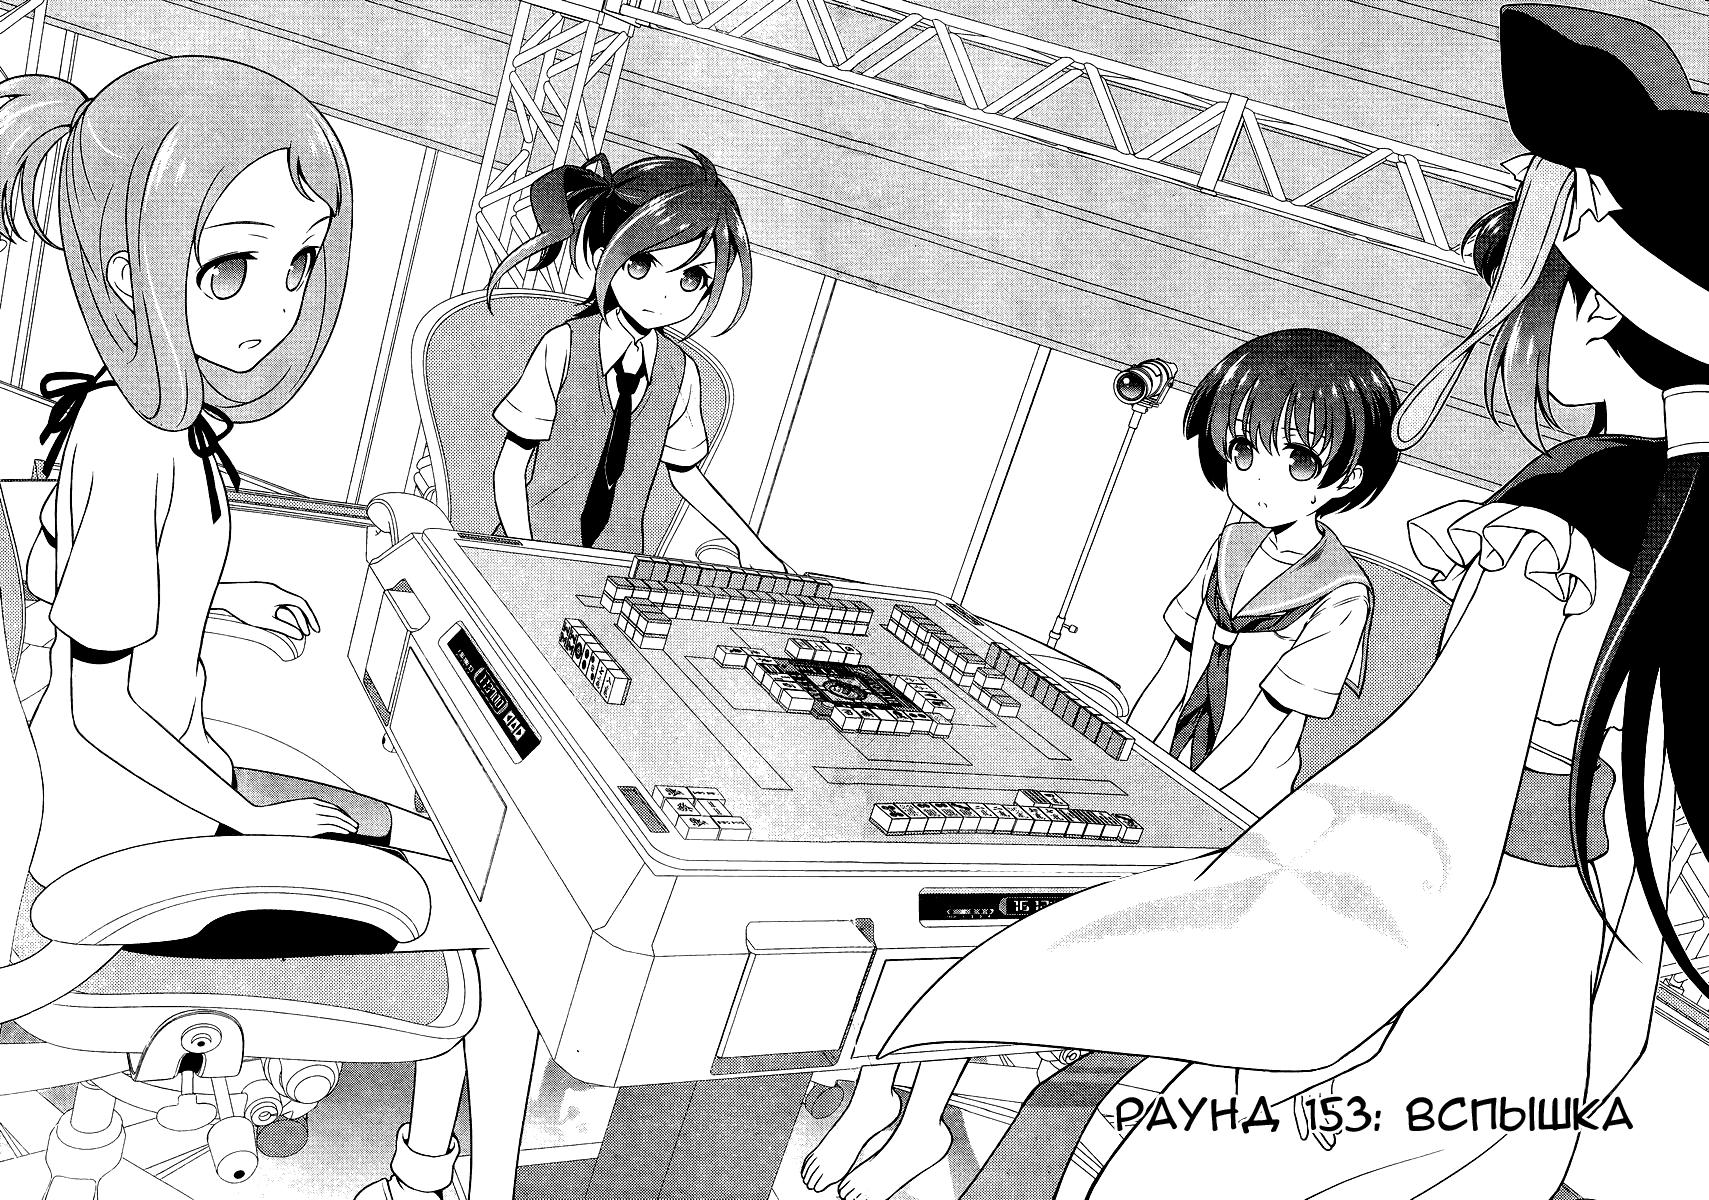 https://r1.ninemanga.com/comics/pic2/33/21665/281535/1451772565945.jpg Page 3